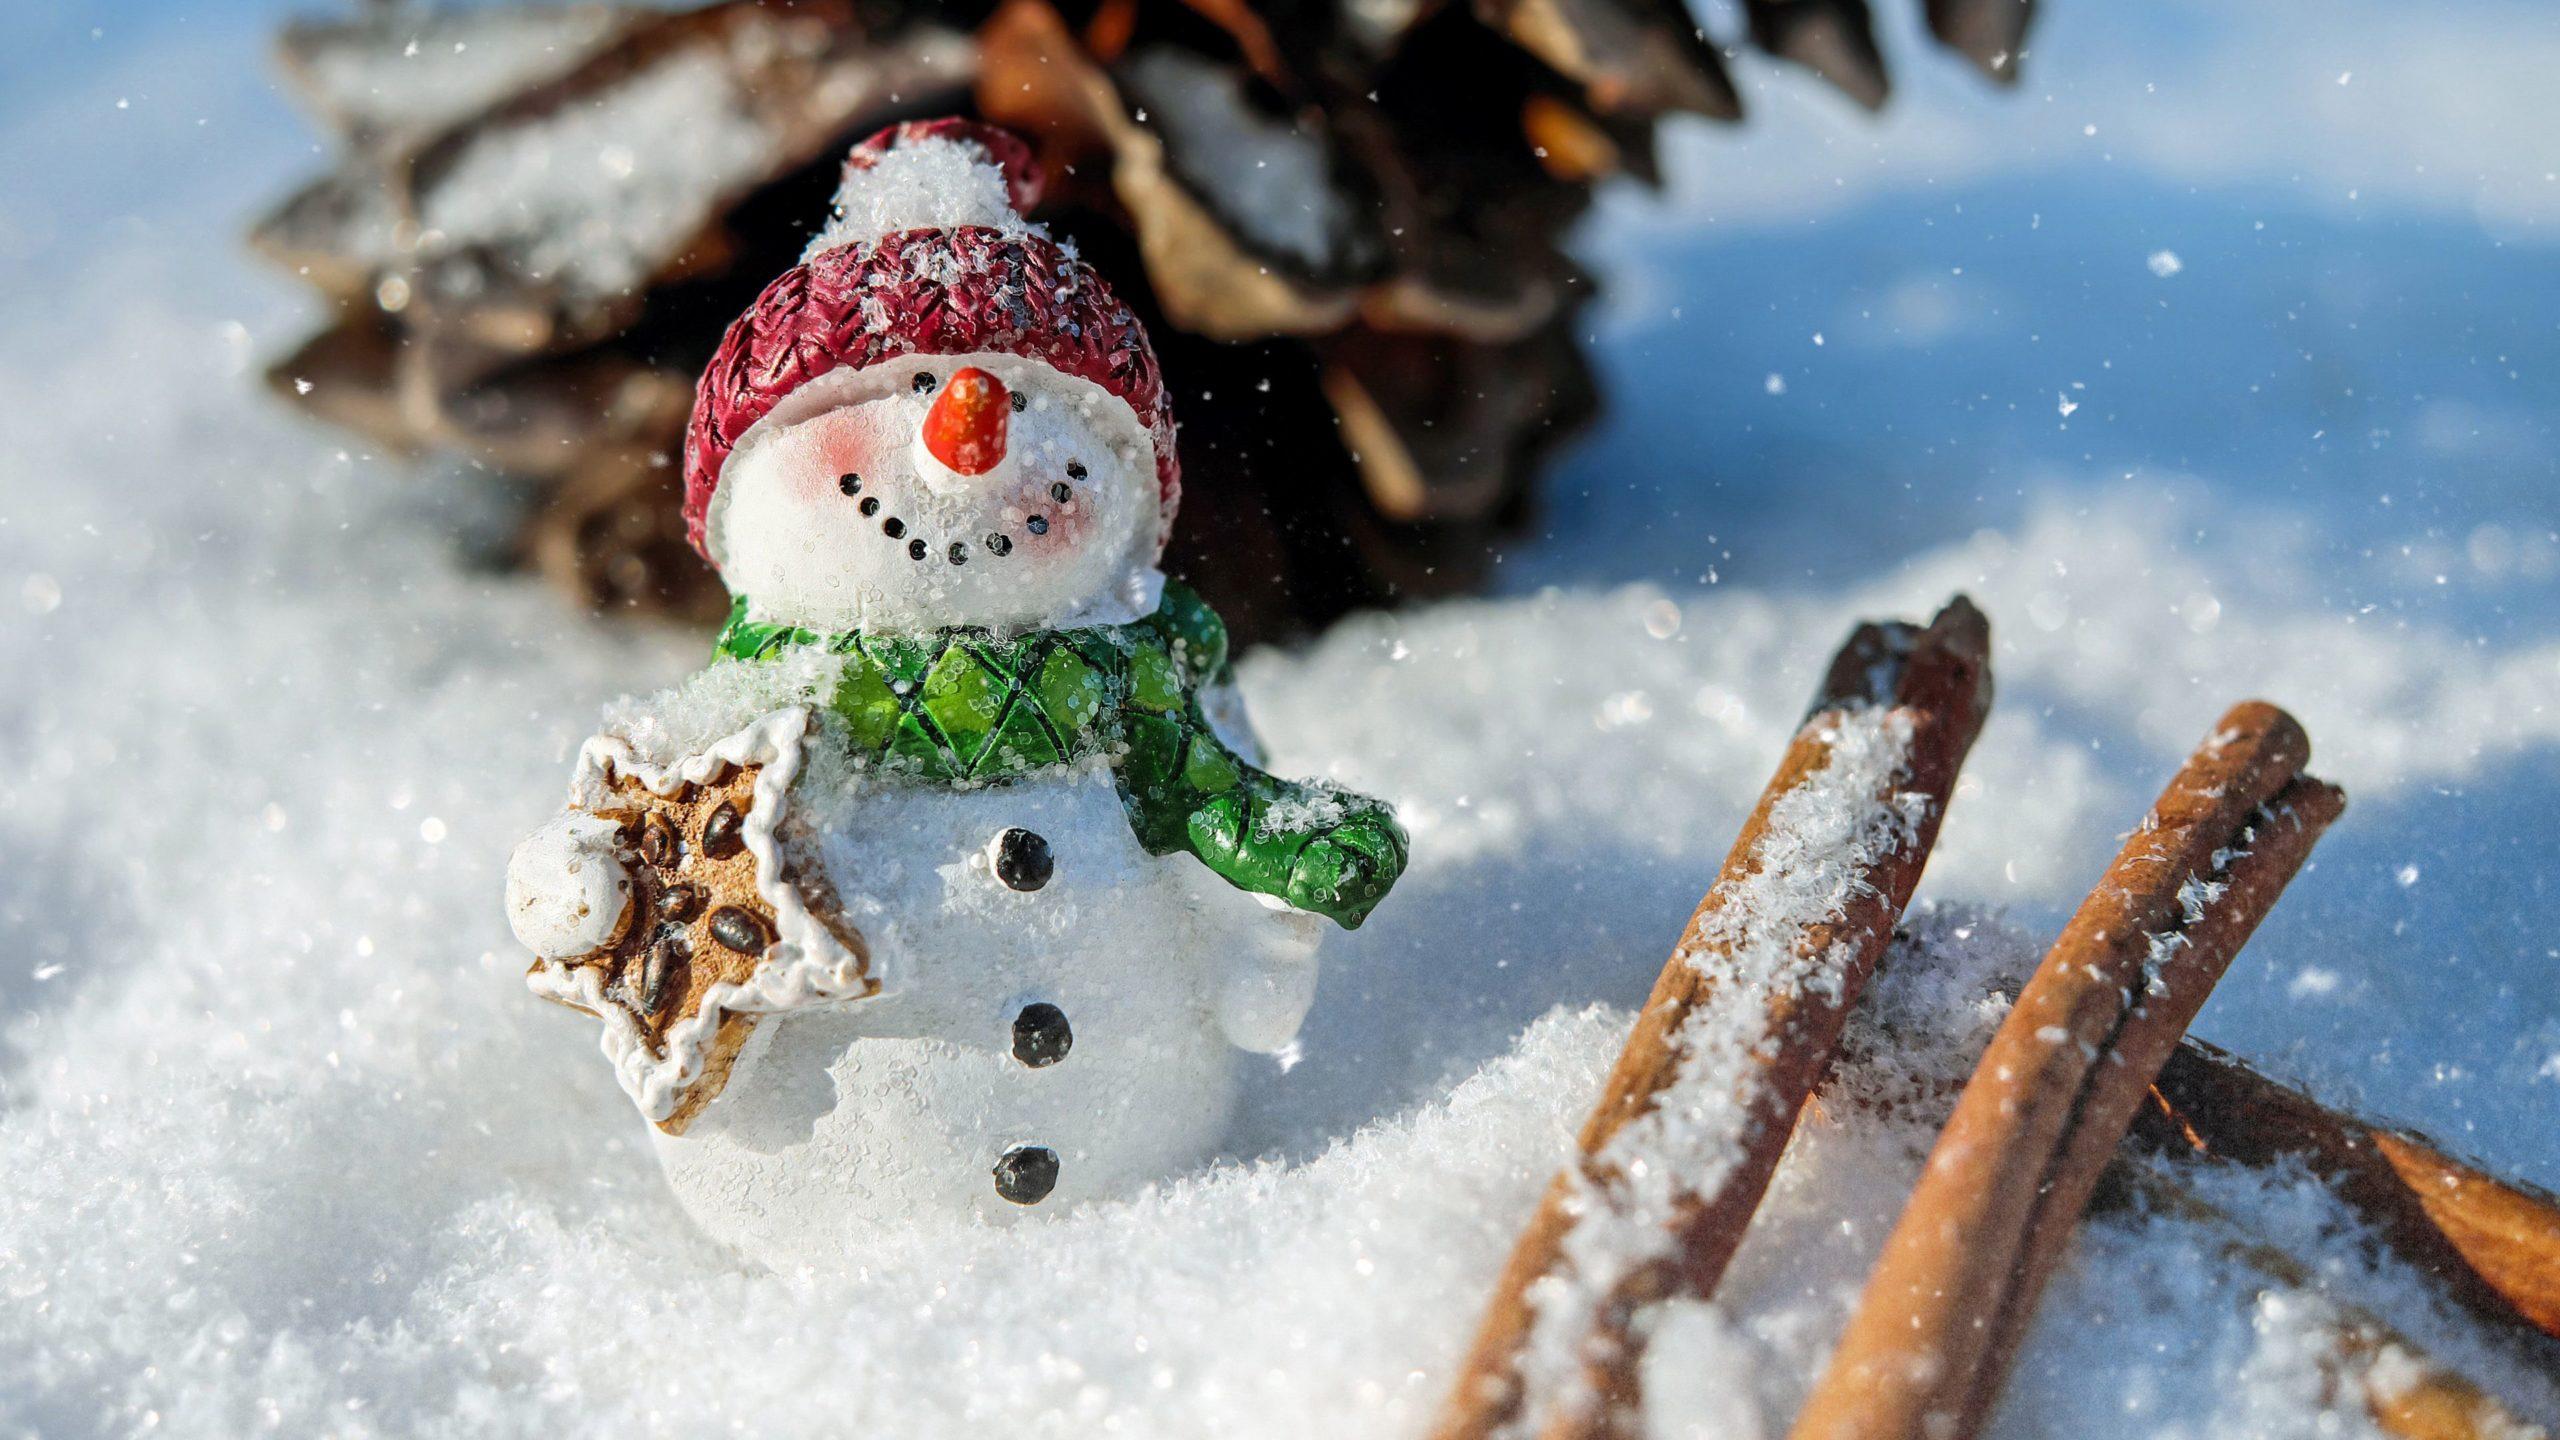 snow desktops photos